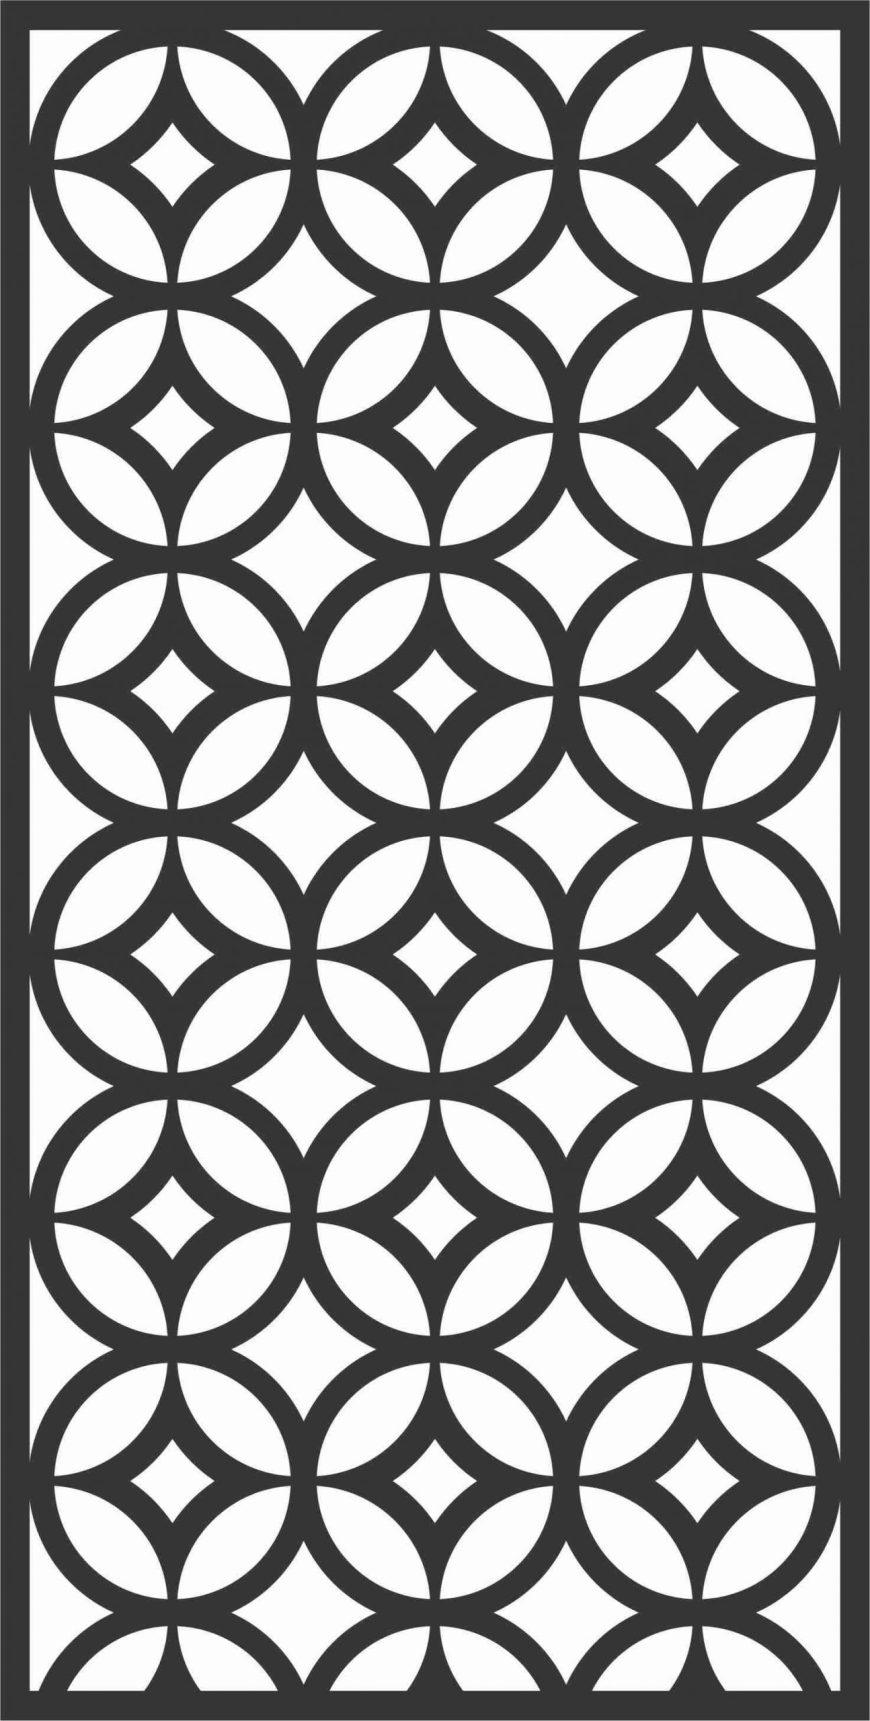 Screen Panel Patterns Seamless 28 Free DXF File